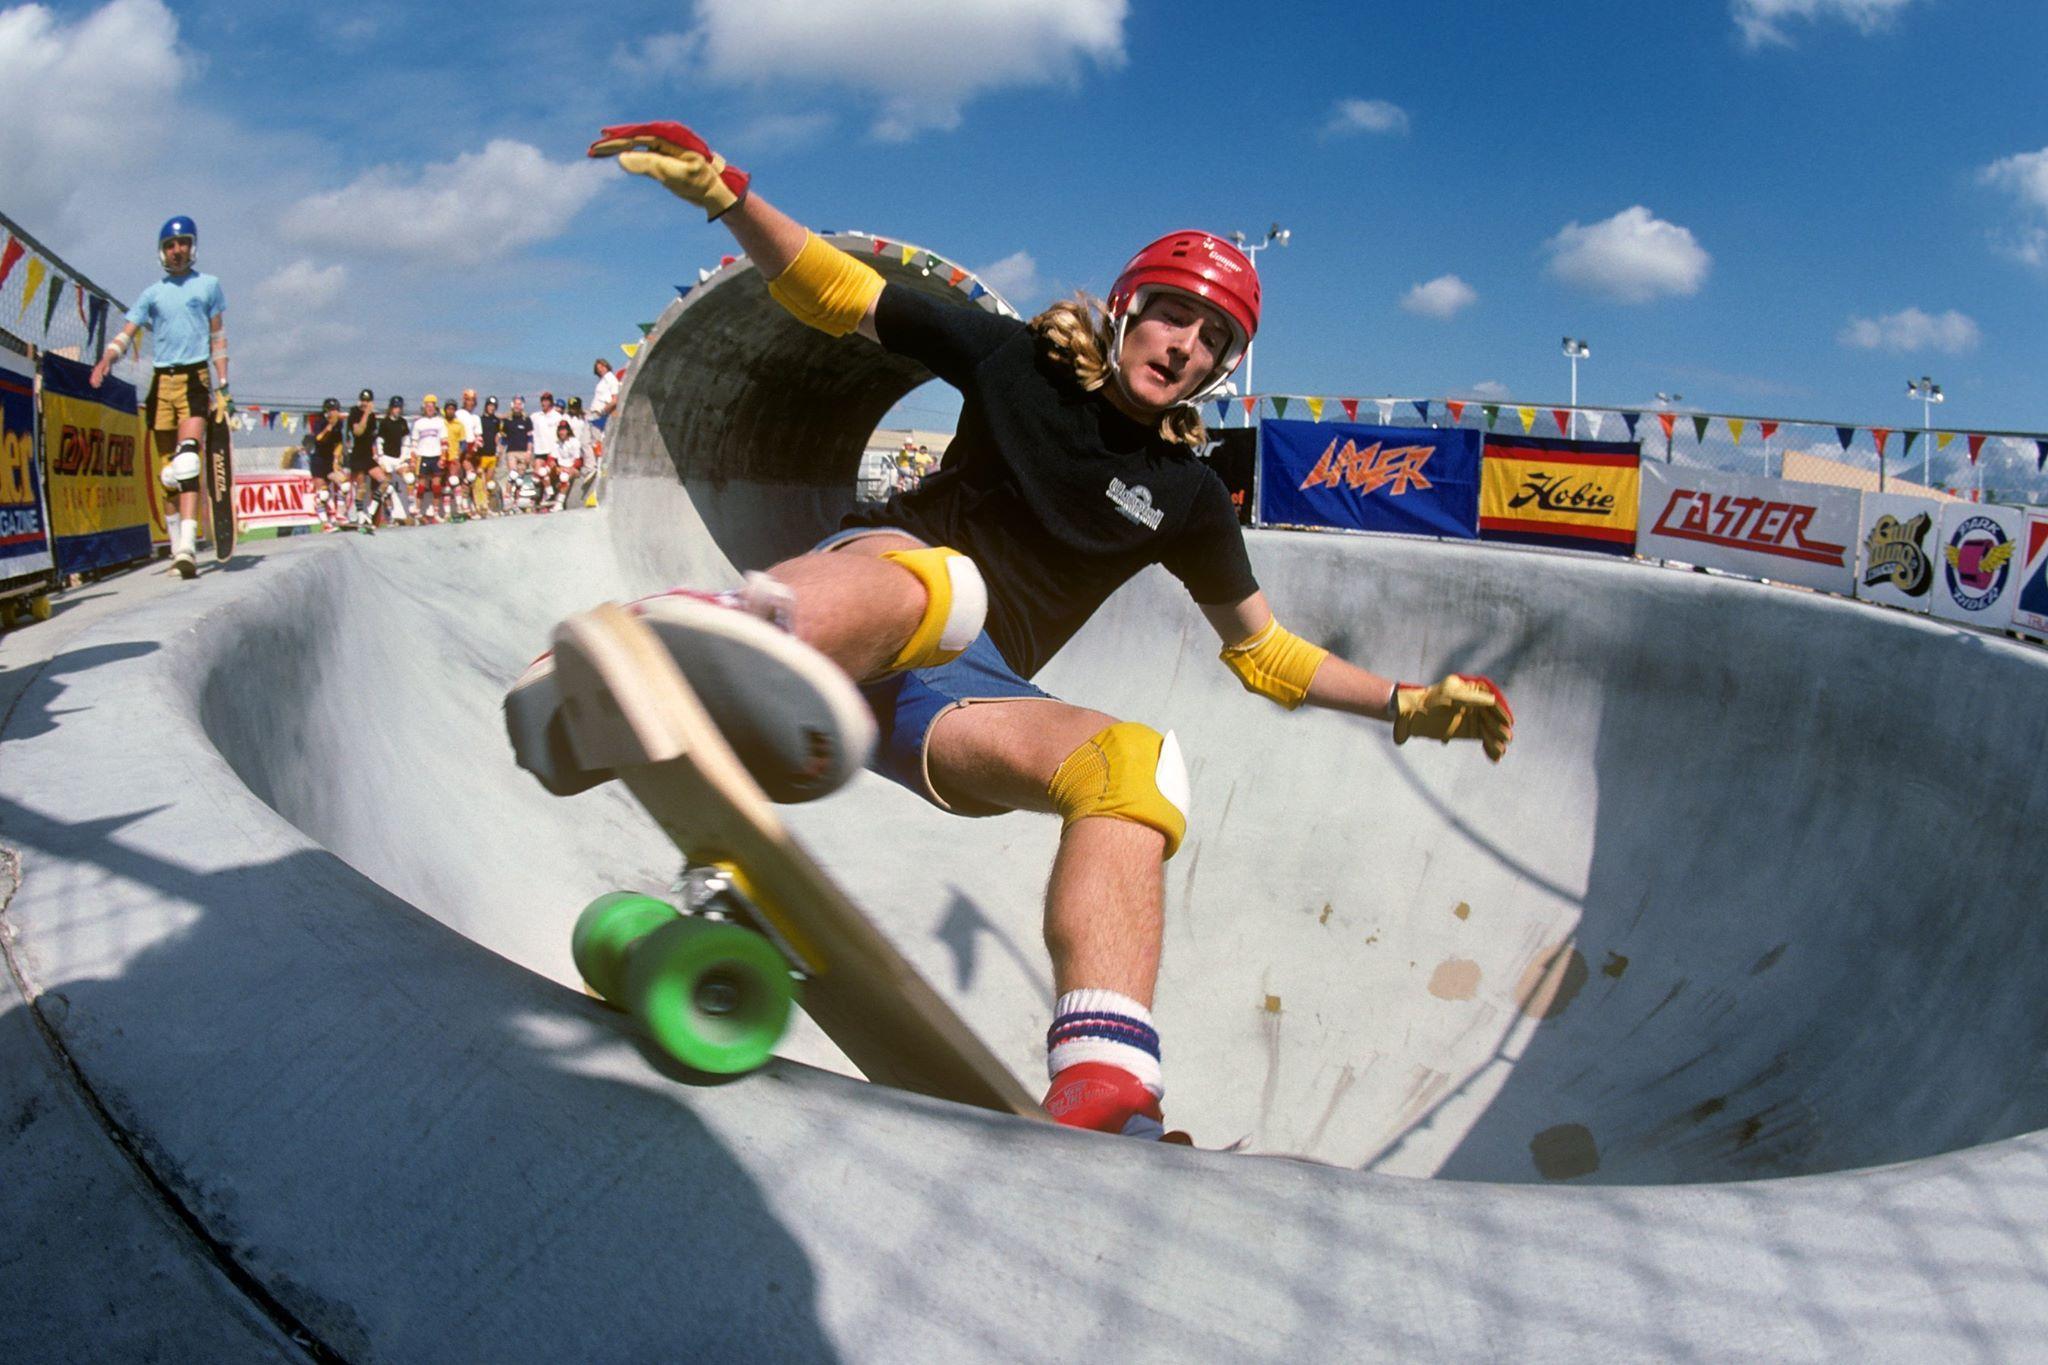 Stacy Peralta 1978 Photo Jim Goodrich #Kryptonics #skate #skateboards #70s #pools #longboarding #skateboarding #skateboarder #skateboard